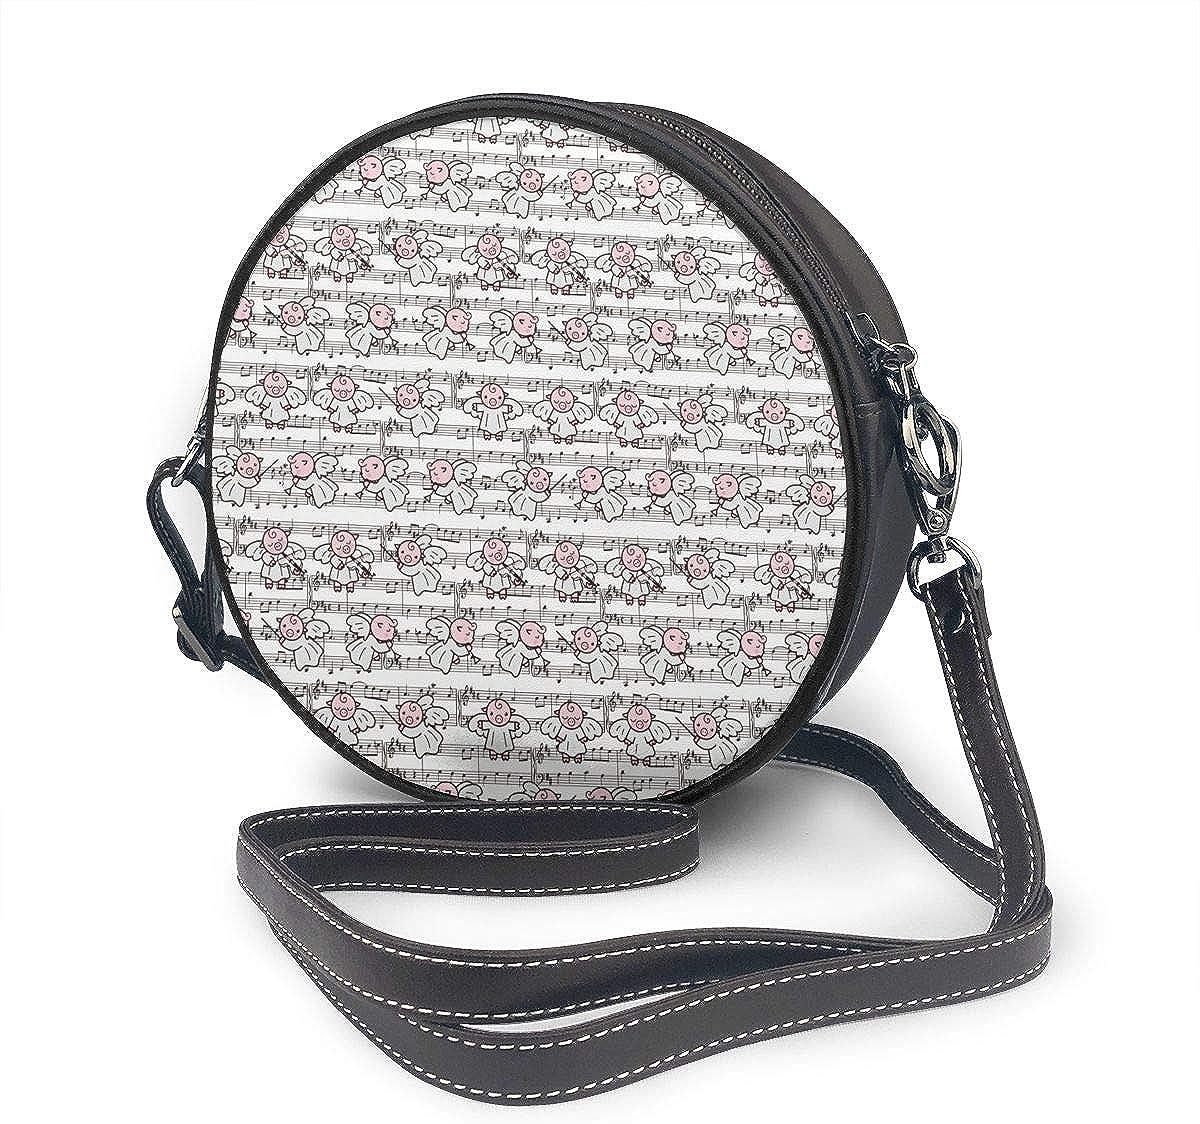 Music Note Cute Pig Round Leather Shoulder Bag Fashion Lady Crossbody Wallet Adjustable Top Handbag For Women Girl